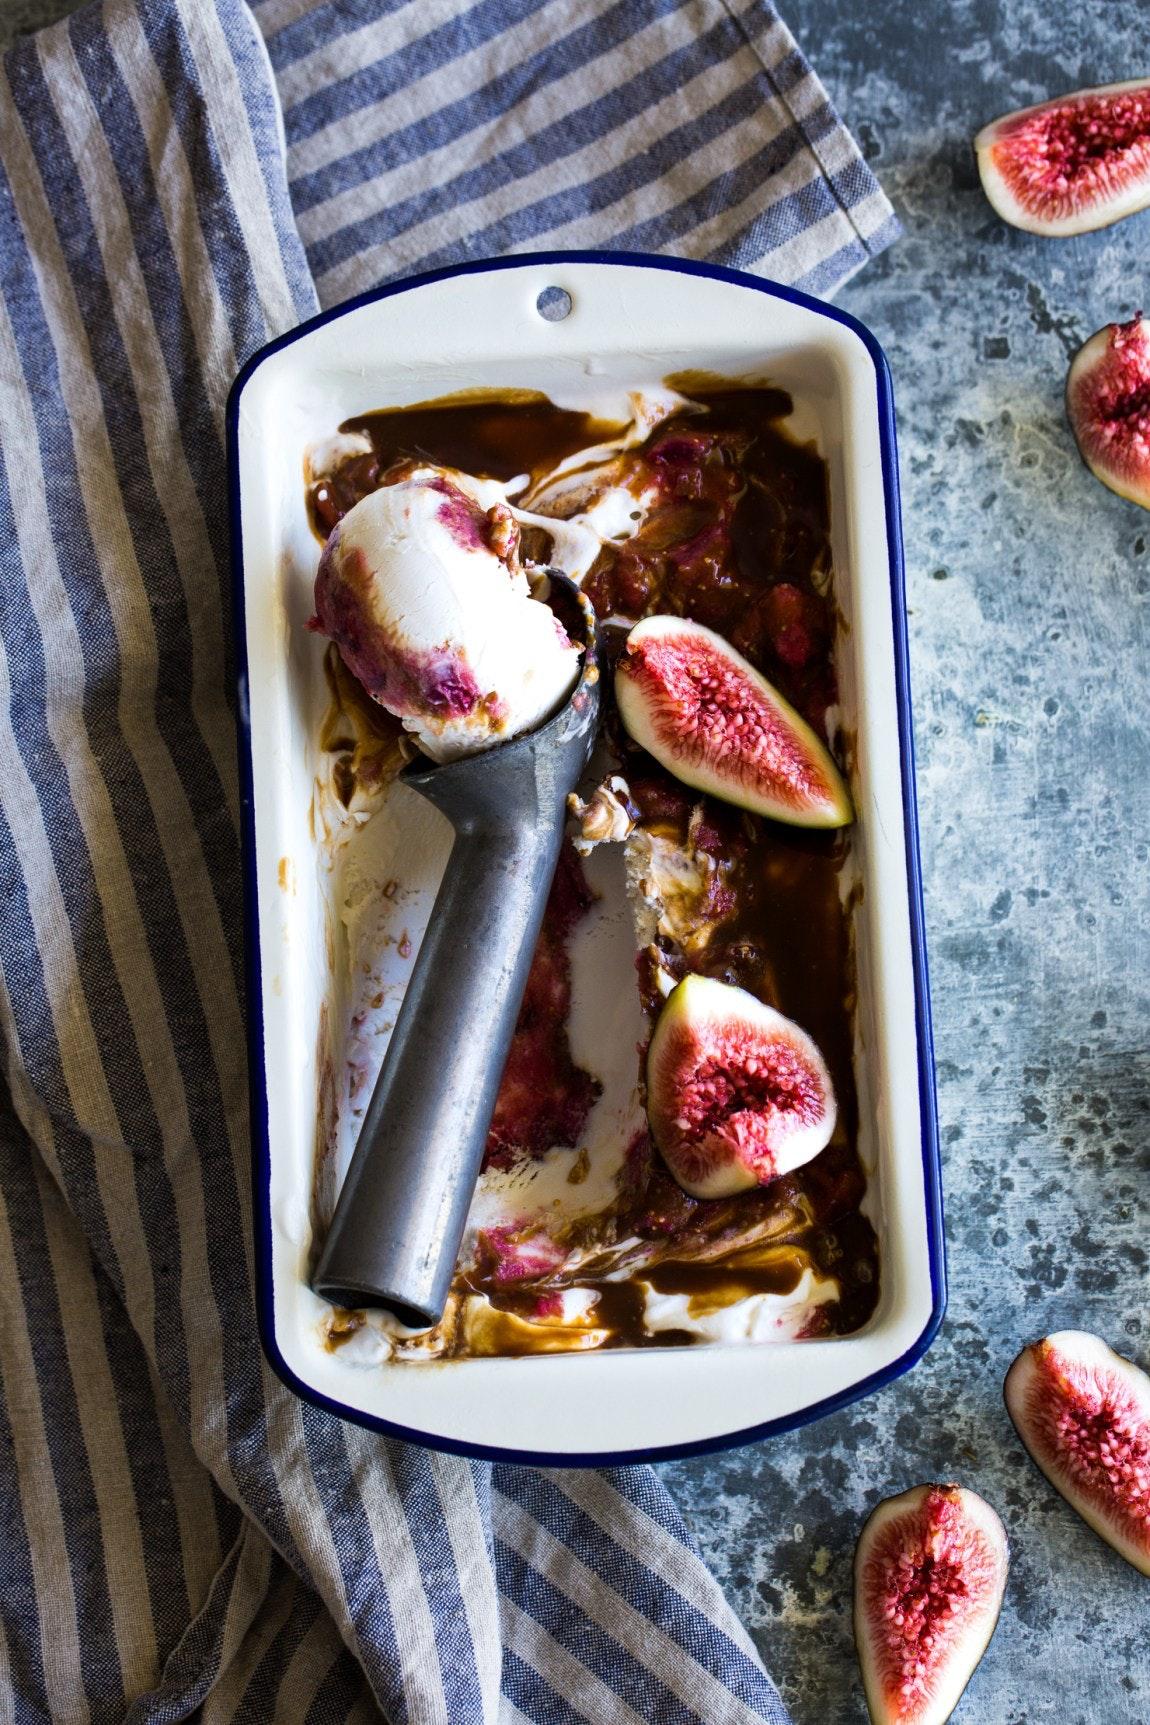 Fig Bourbon Caramel Ripple Cashew Ice Cream Vegan 6 Of 1